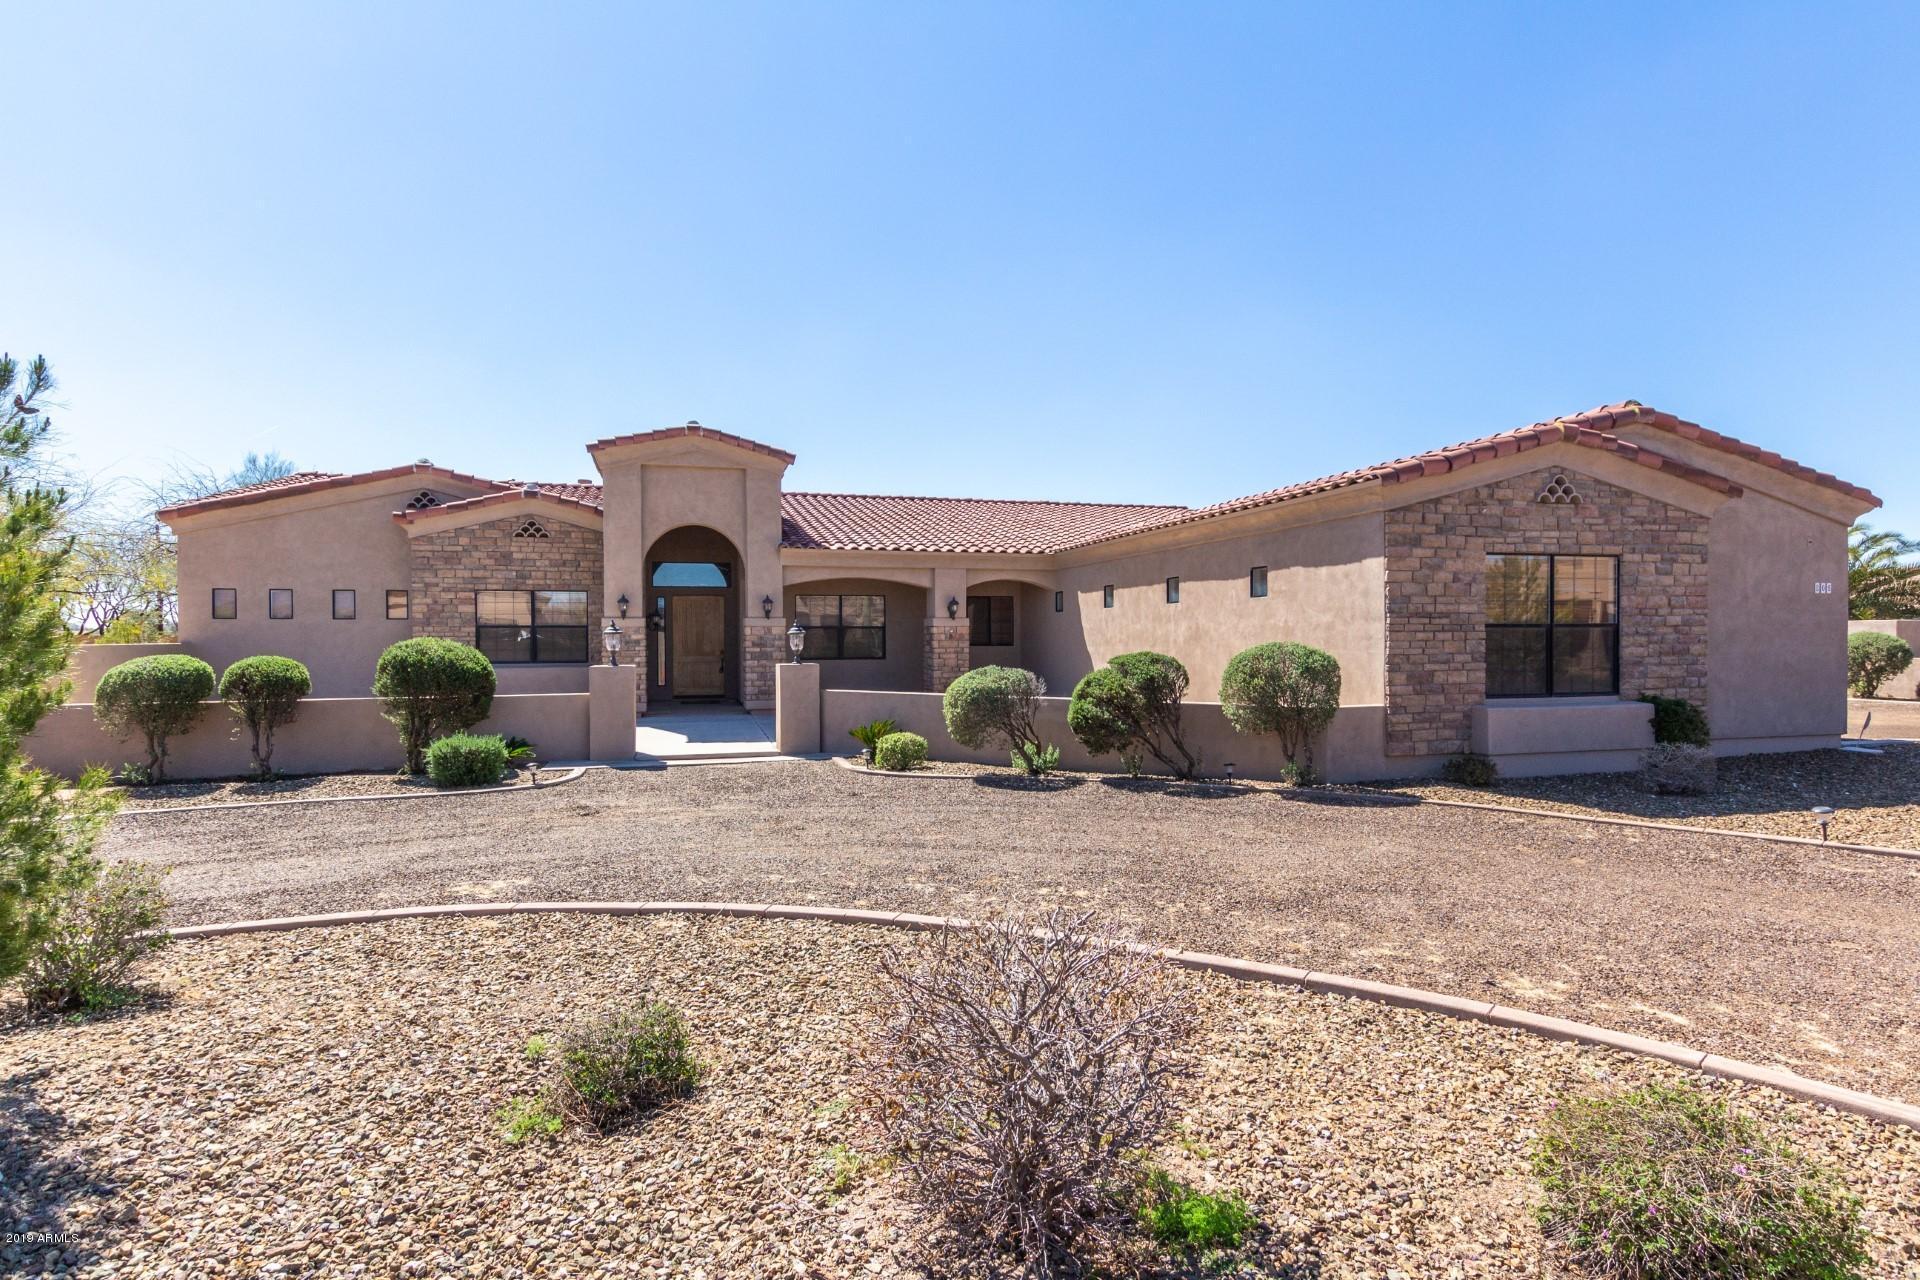 MLS 5904606 805 W WINDWARD Court, Phoenix, AZ 85086 Equestrian Homes in Phoenix